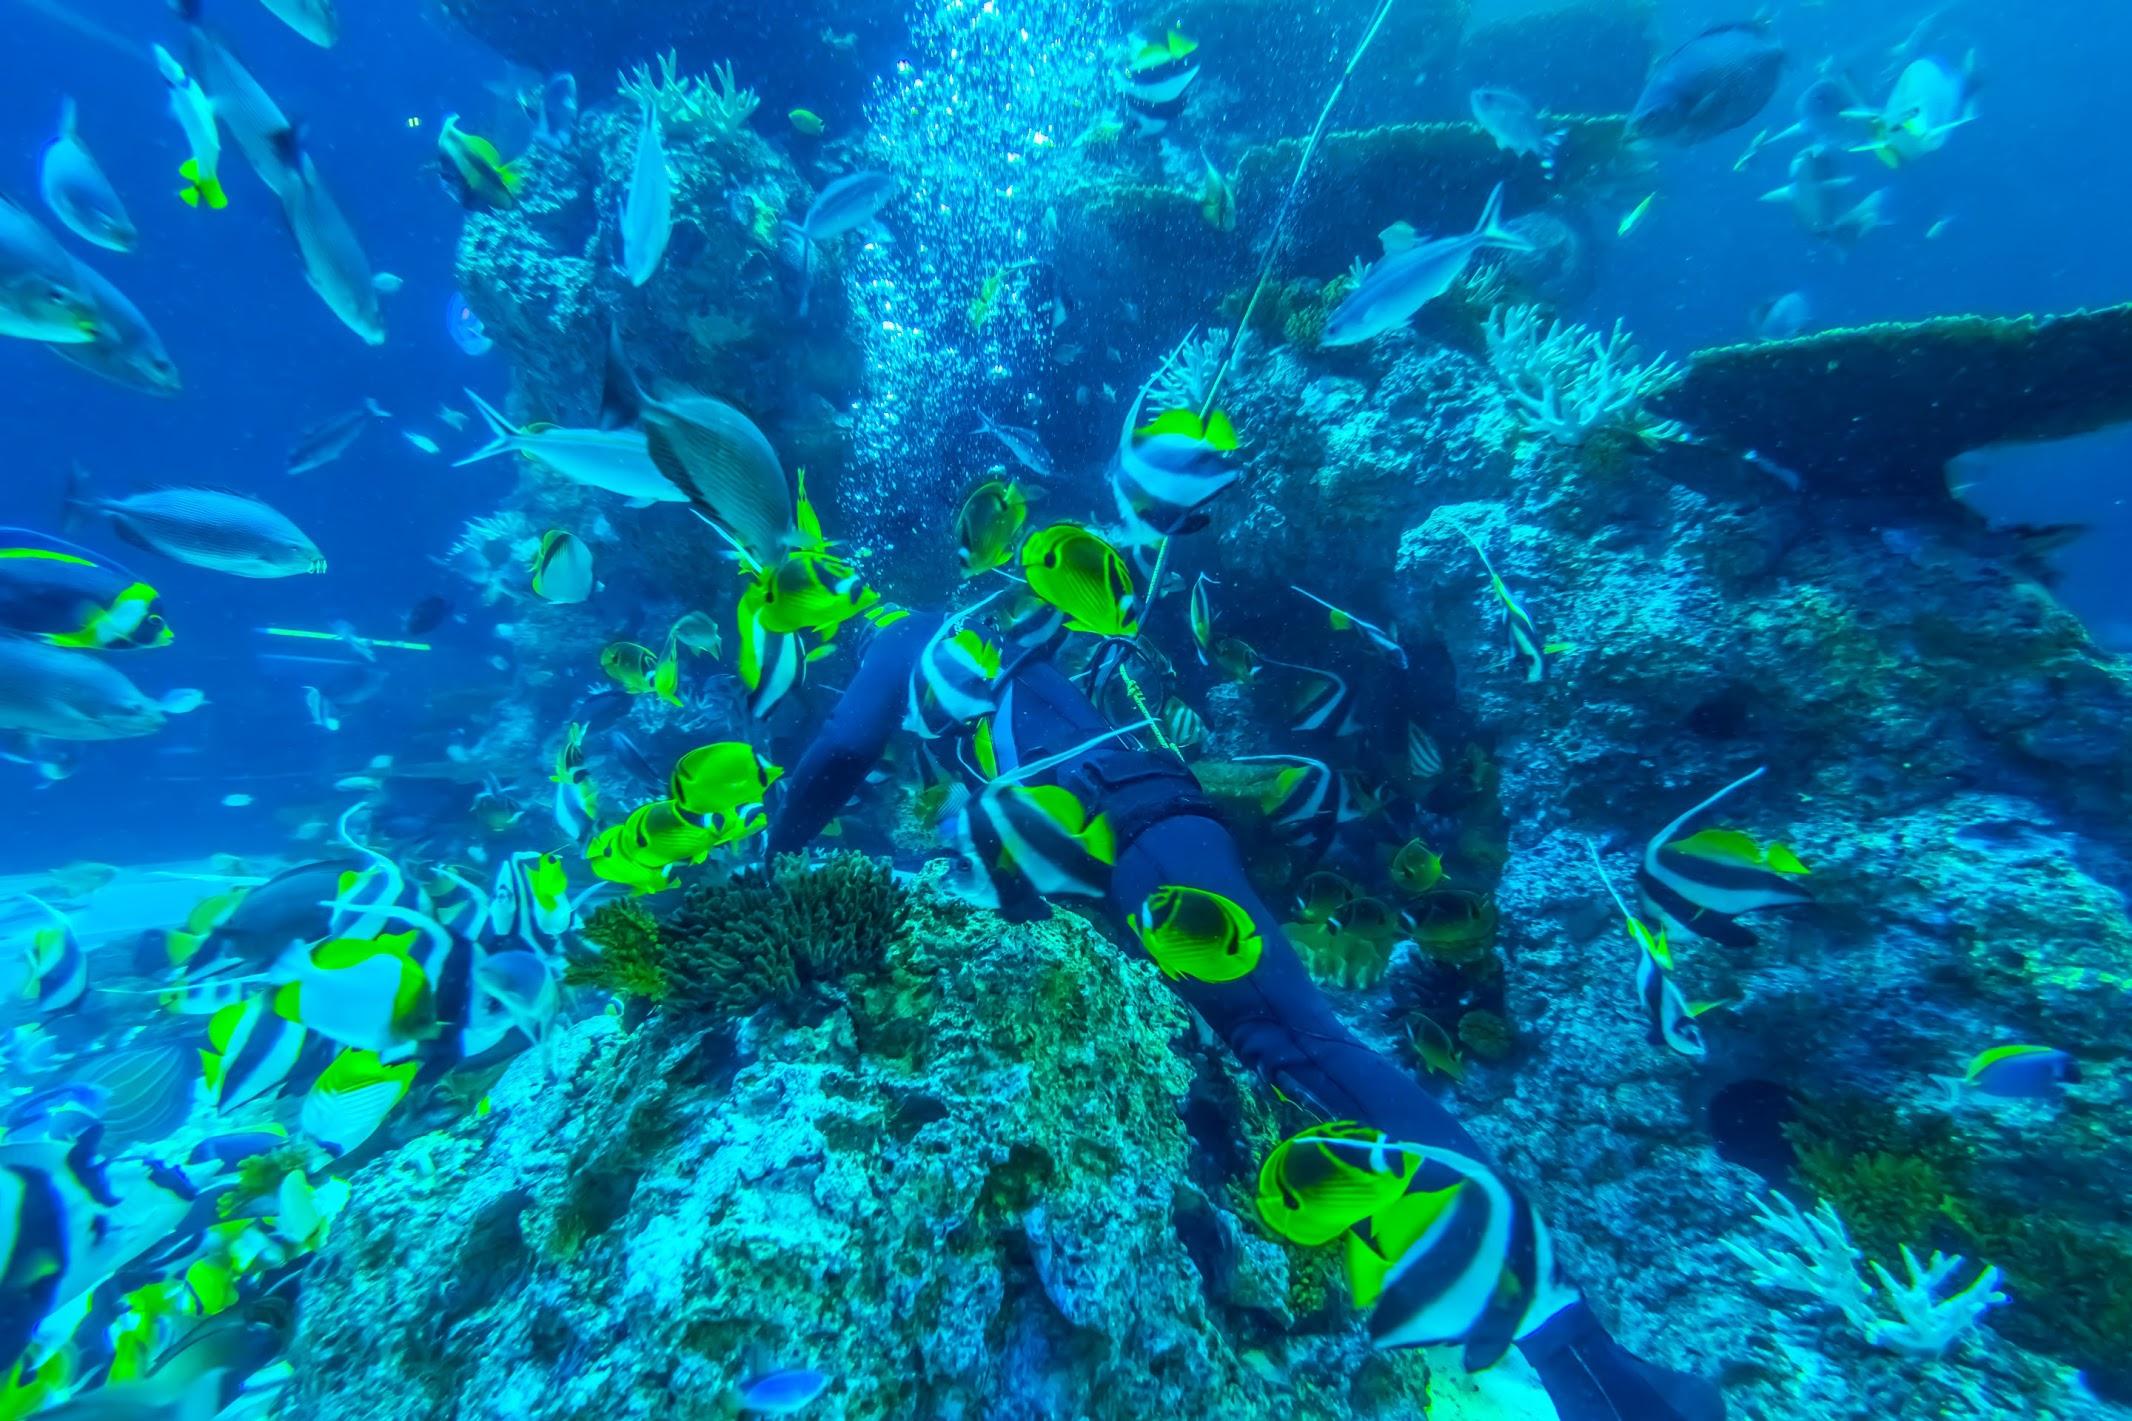 Singapore Sentosa S.E.A. Aquarium Coral Garden2